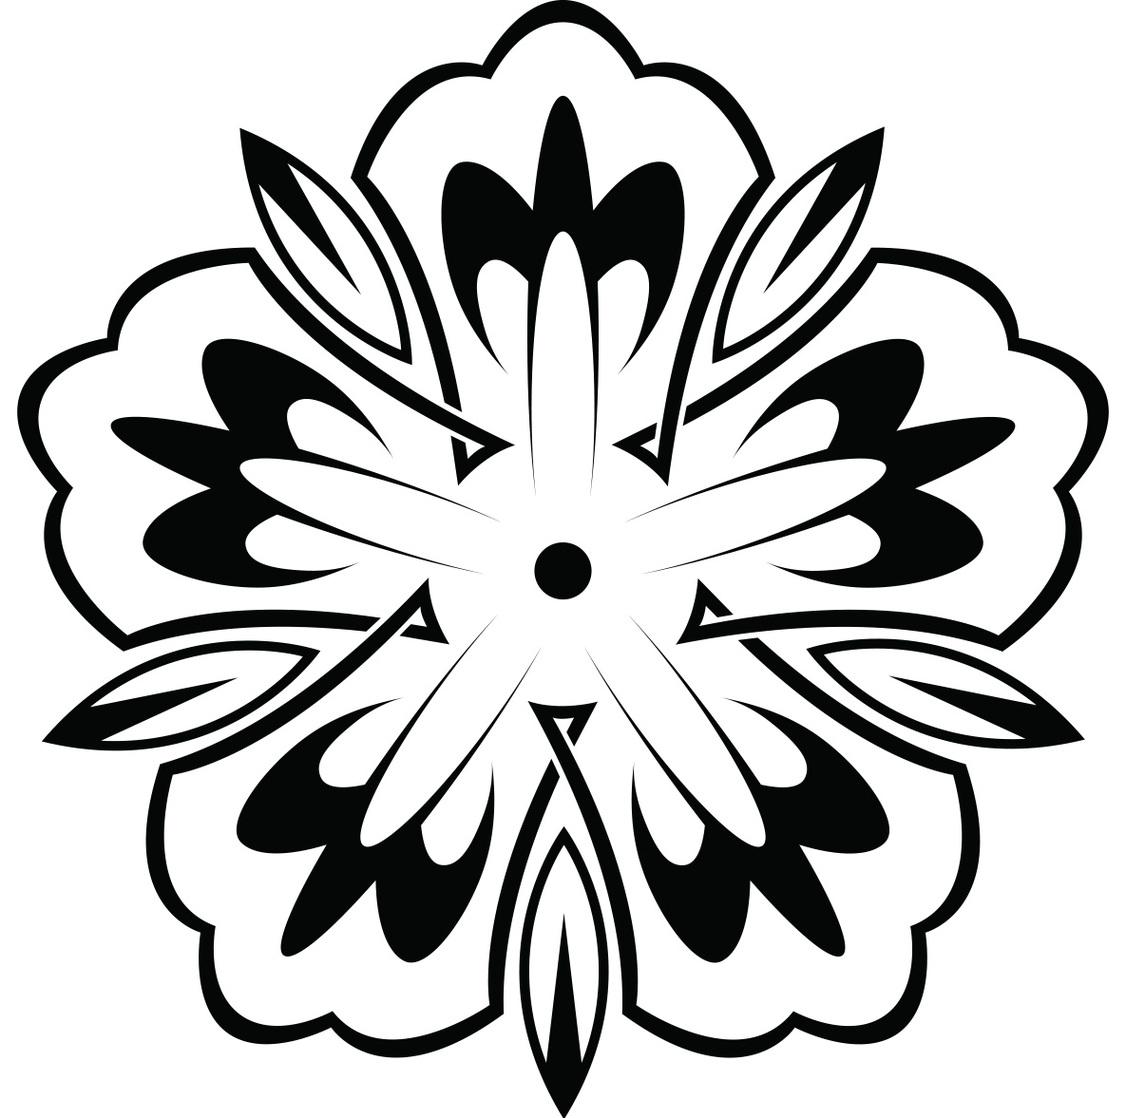 Honu petroglyph coloring pages ~ Free Maui Cliparts, Download Free Clip Art, Free Clip Art ...